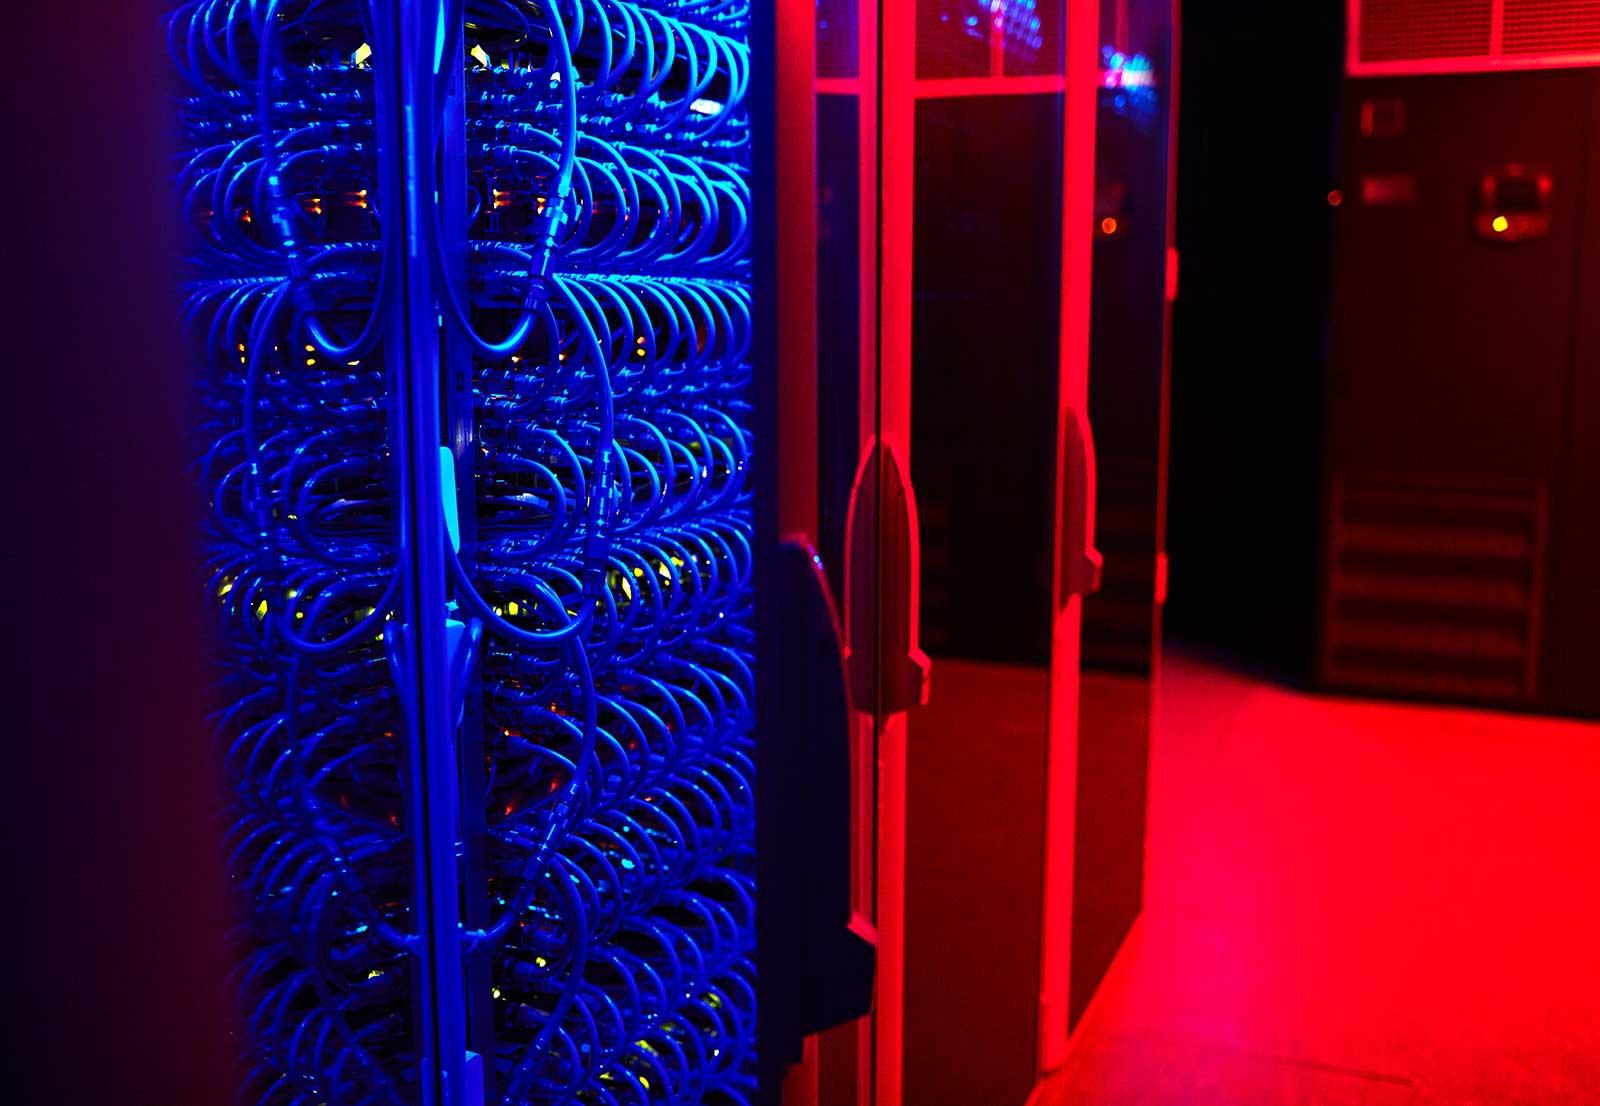 datacenter transformation consulting cloudskope.com